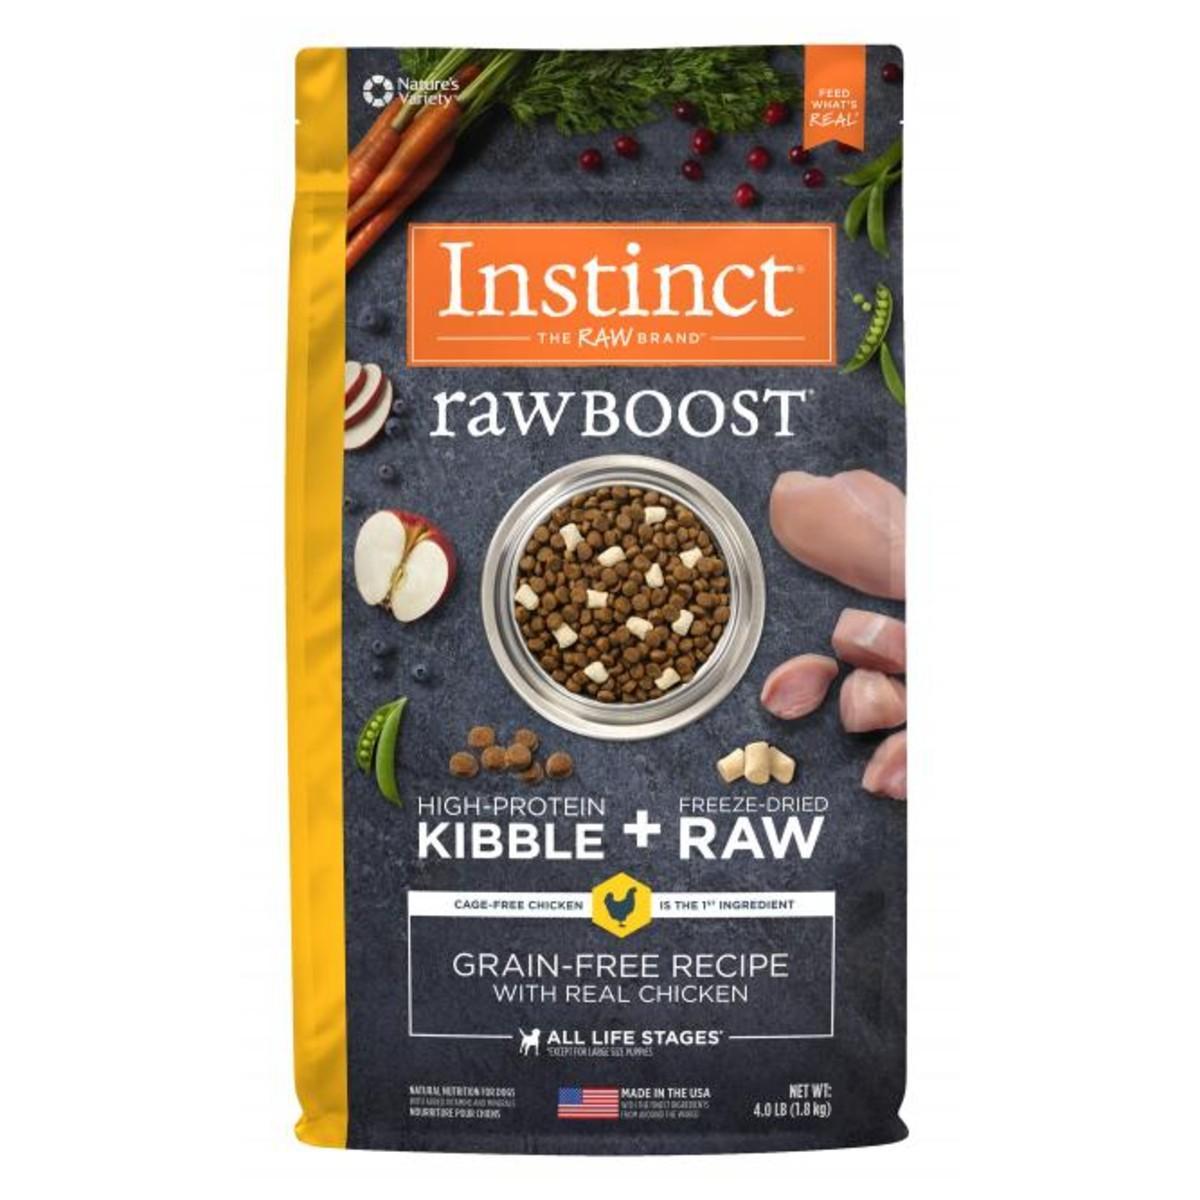 Nature's Variety Instinct Raw Boost Dog Food - Real Chicken